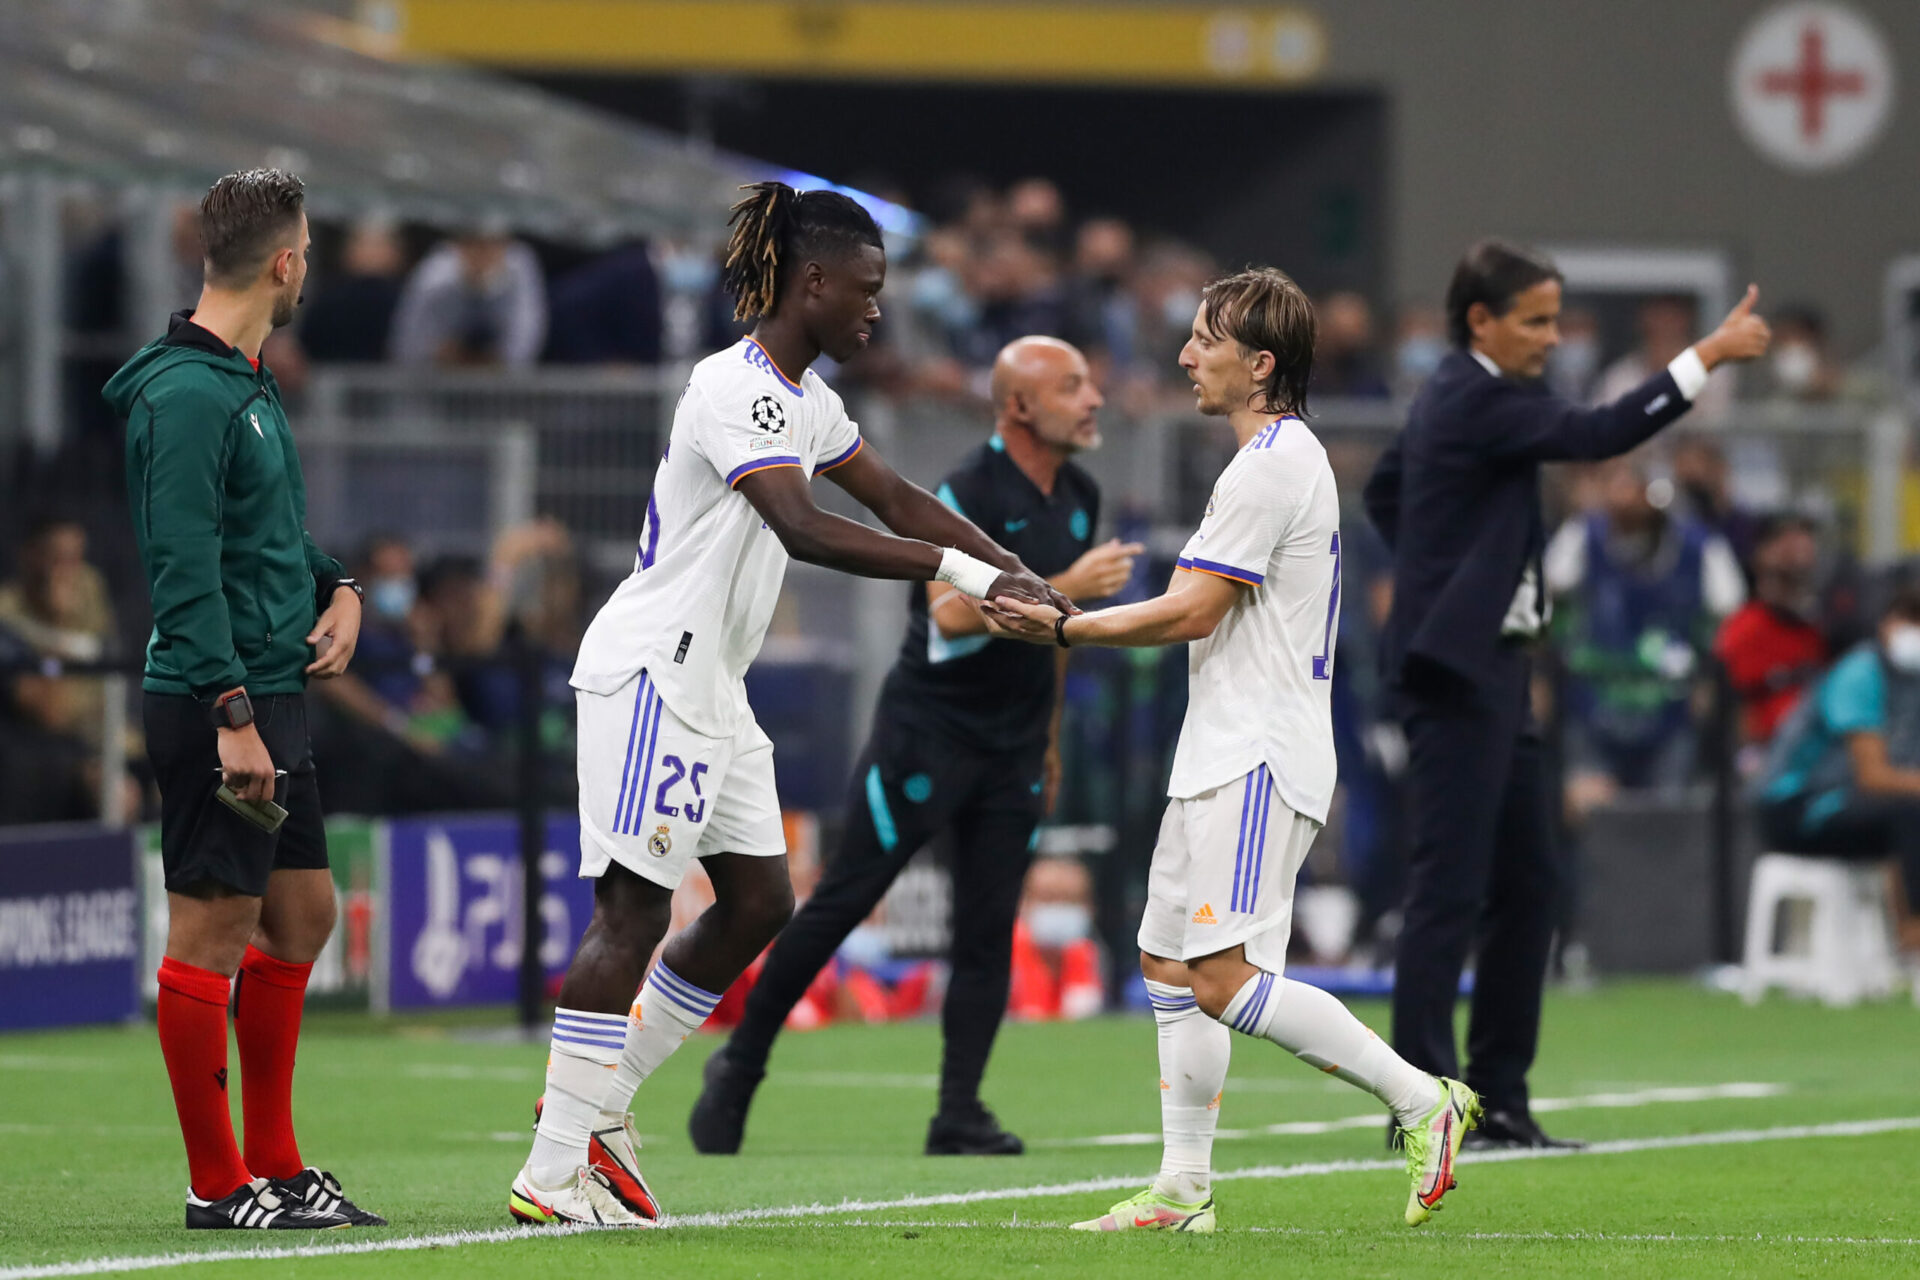 À Giuseppe Meazza, Eduardo Camavinga est entré à la place de Luka Modrić à la 80e minute de jeu (iconsport)